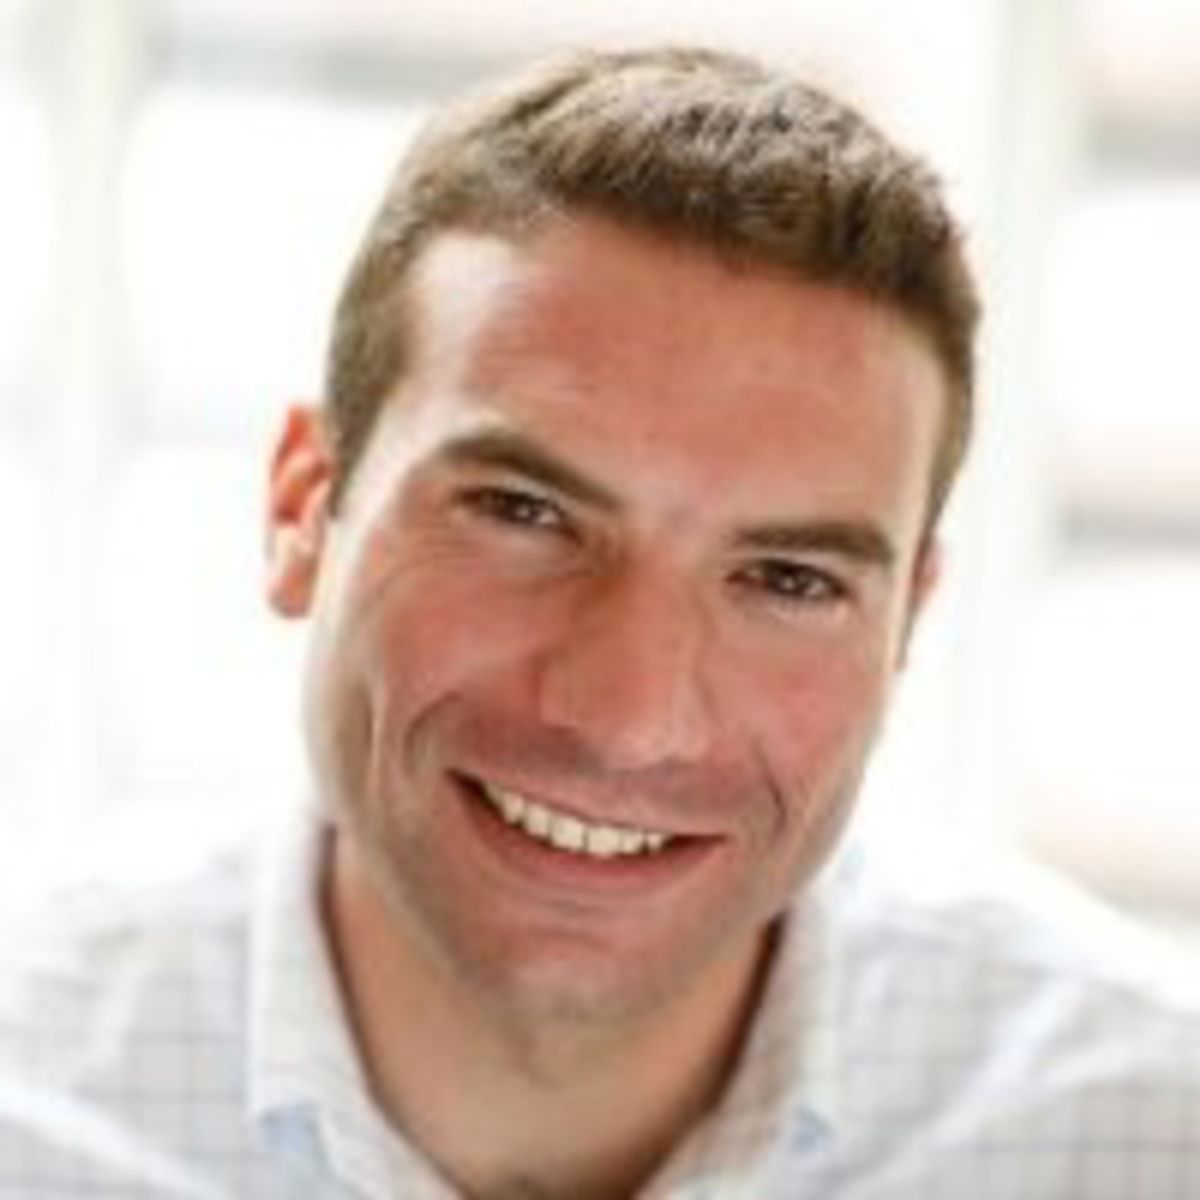 Photo of Abe Yokell, Managing Partner at Congruent Ventures